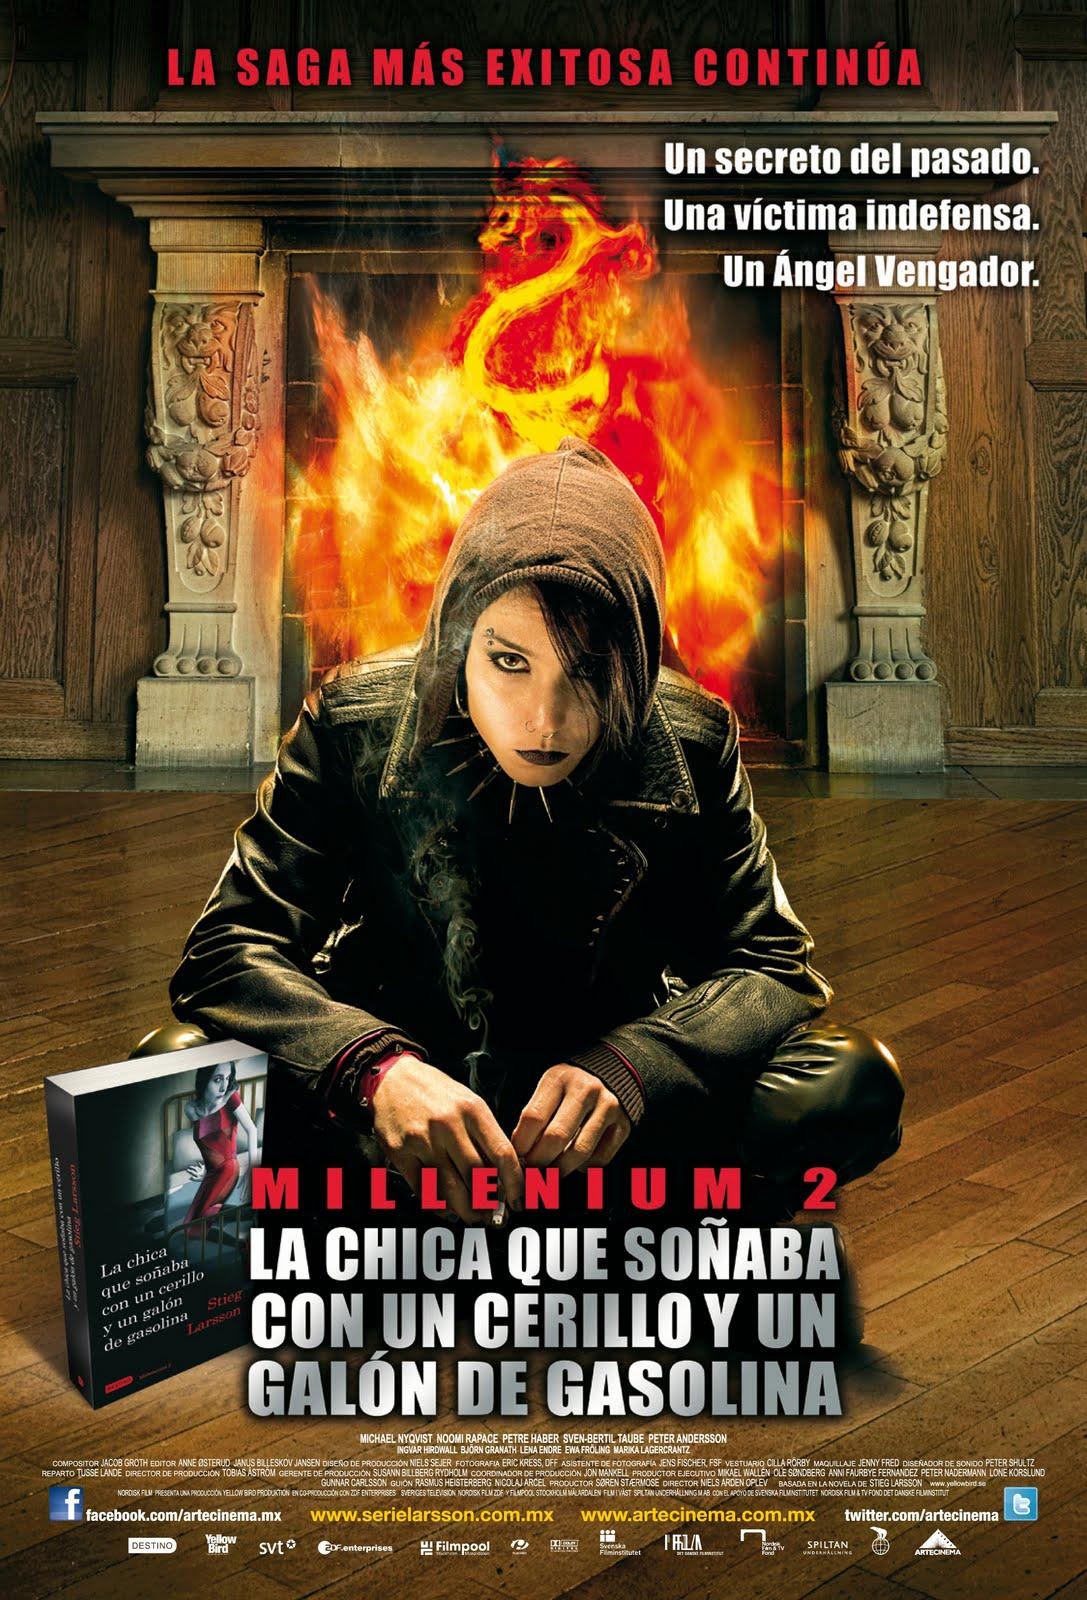 http://4.bp.blogspot.com/-yvW7YcSEayM/Te23TziyTLI/AAAAAAAABPs/XzpR_cAid_M/s1600/Millenium+2+poster.jpg